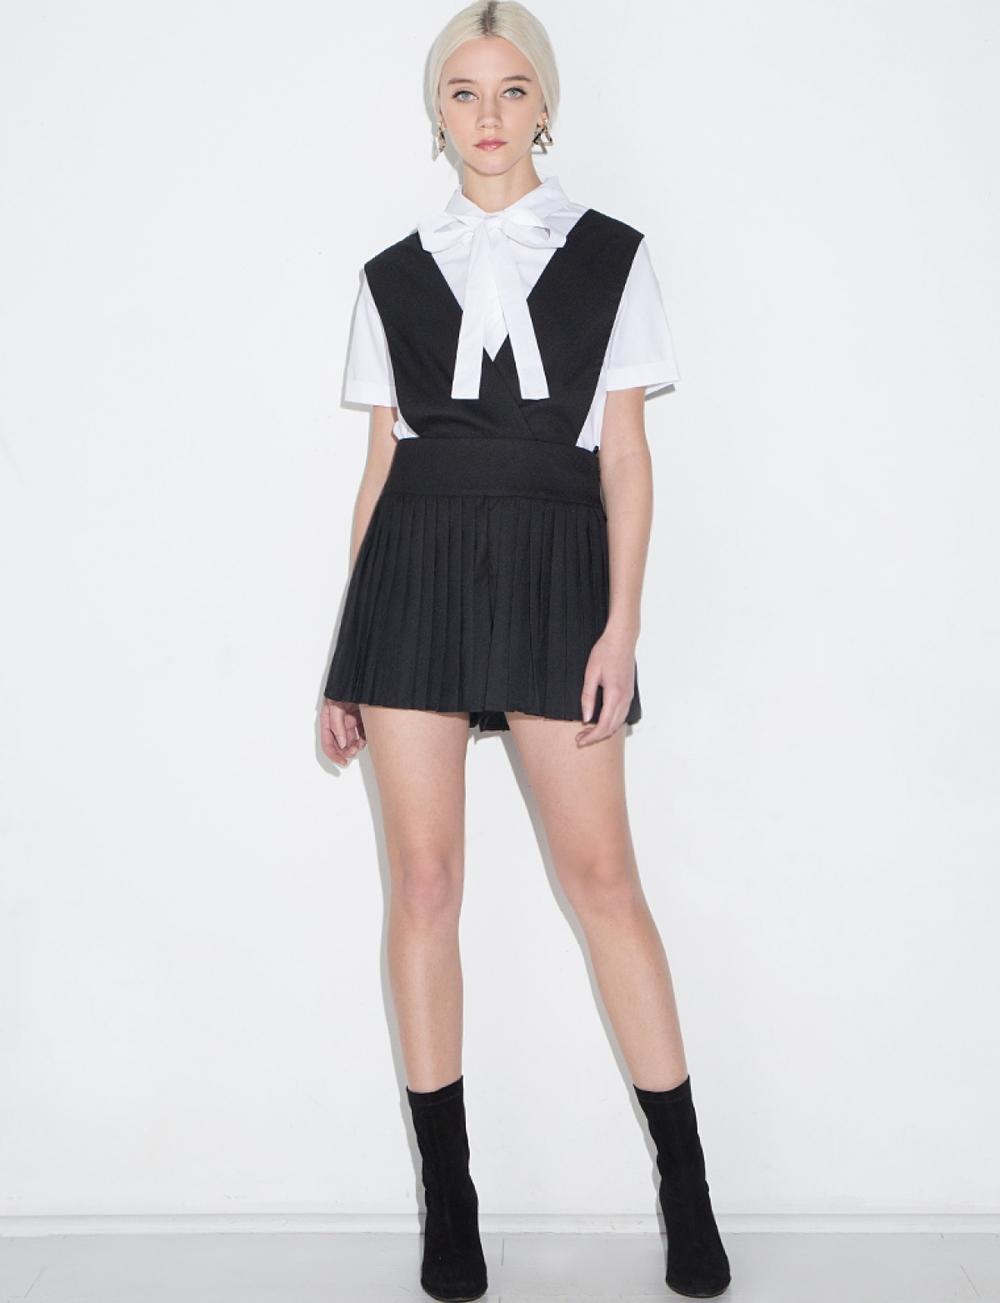 black-suspender-shorts-0e7a5253-1.jpg